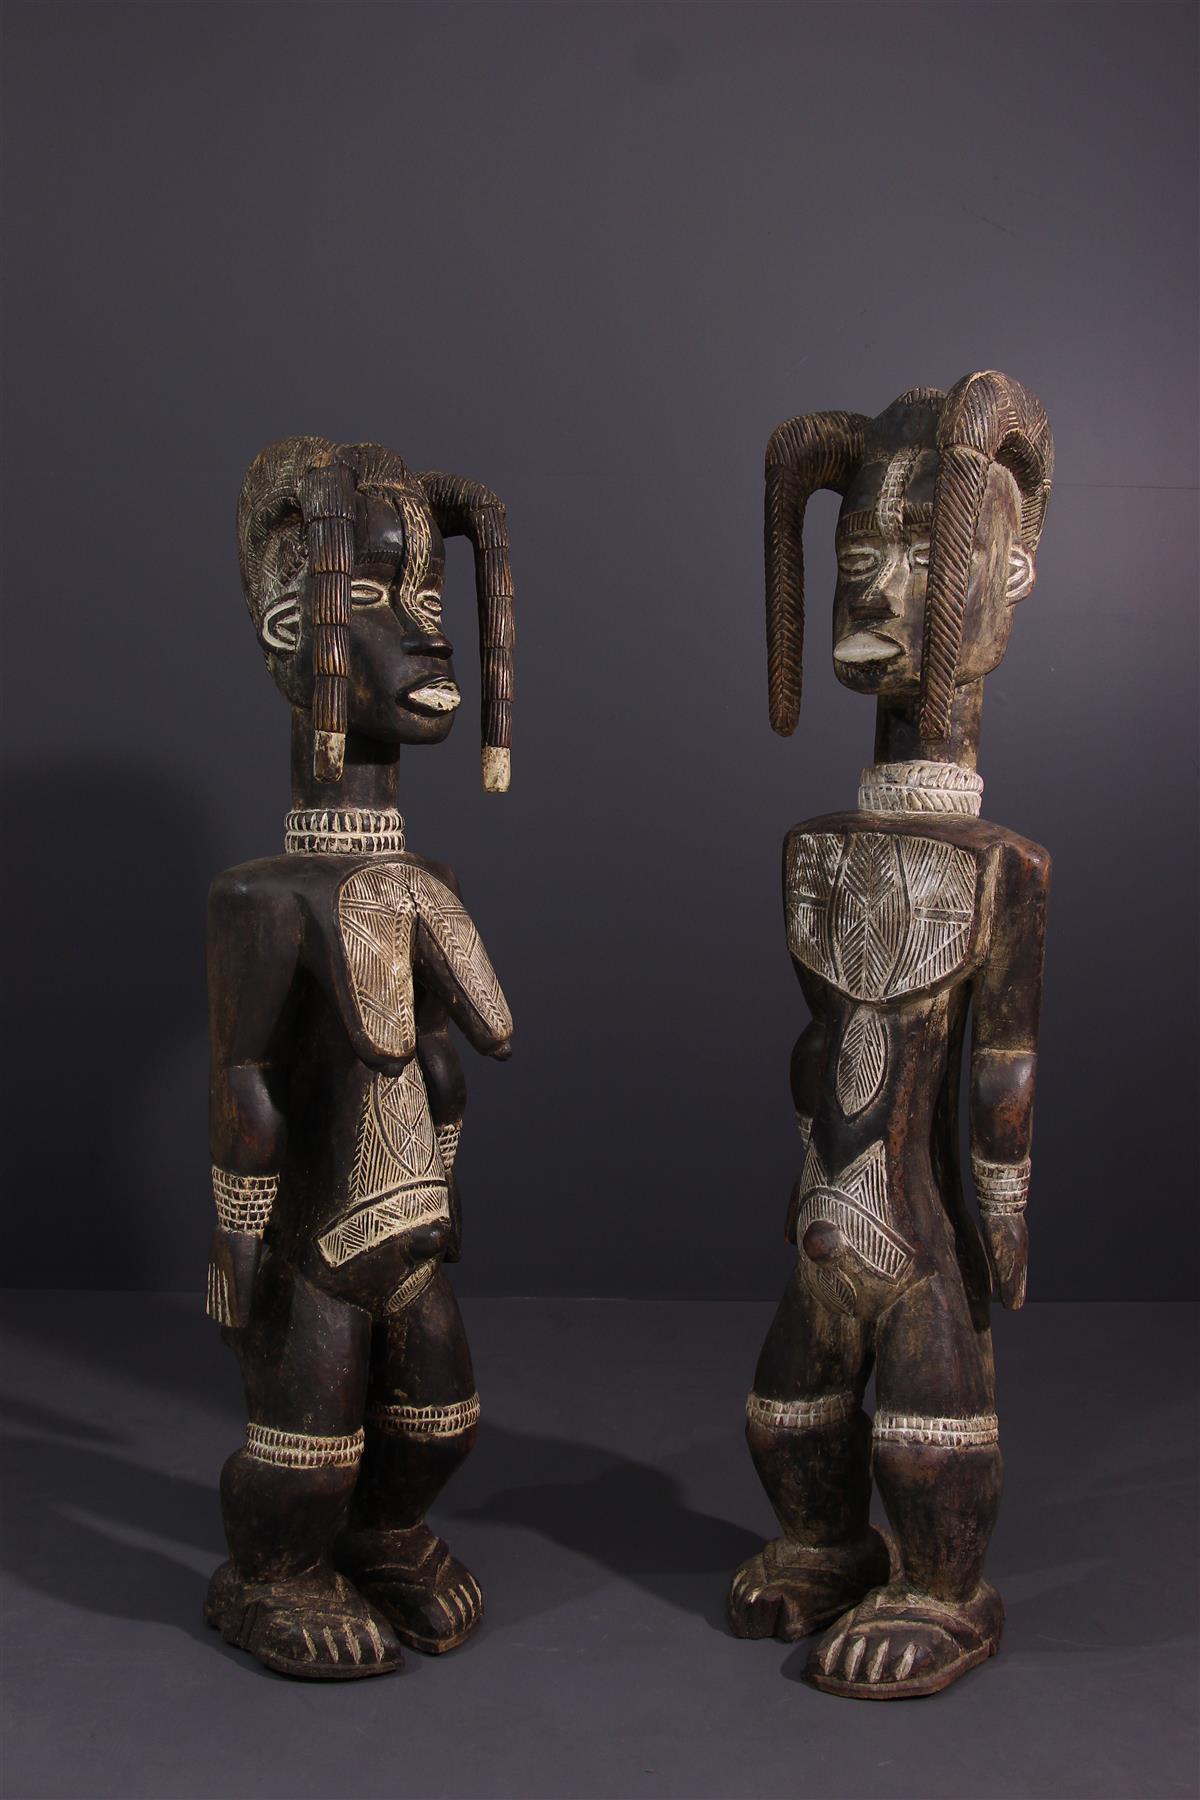 Dan statues - Tribal art